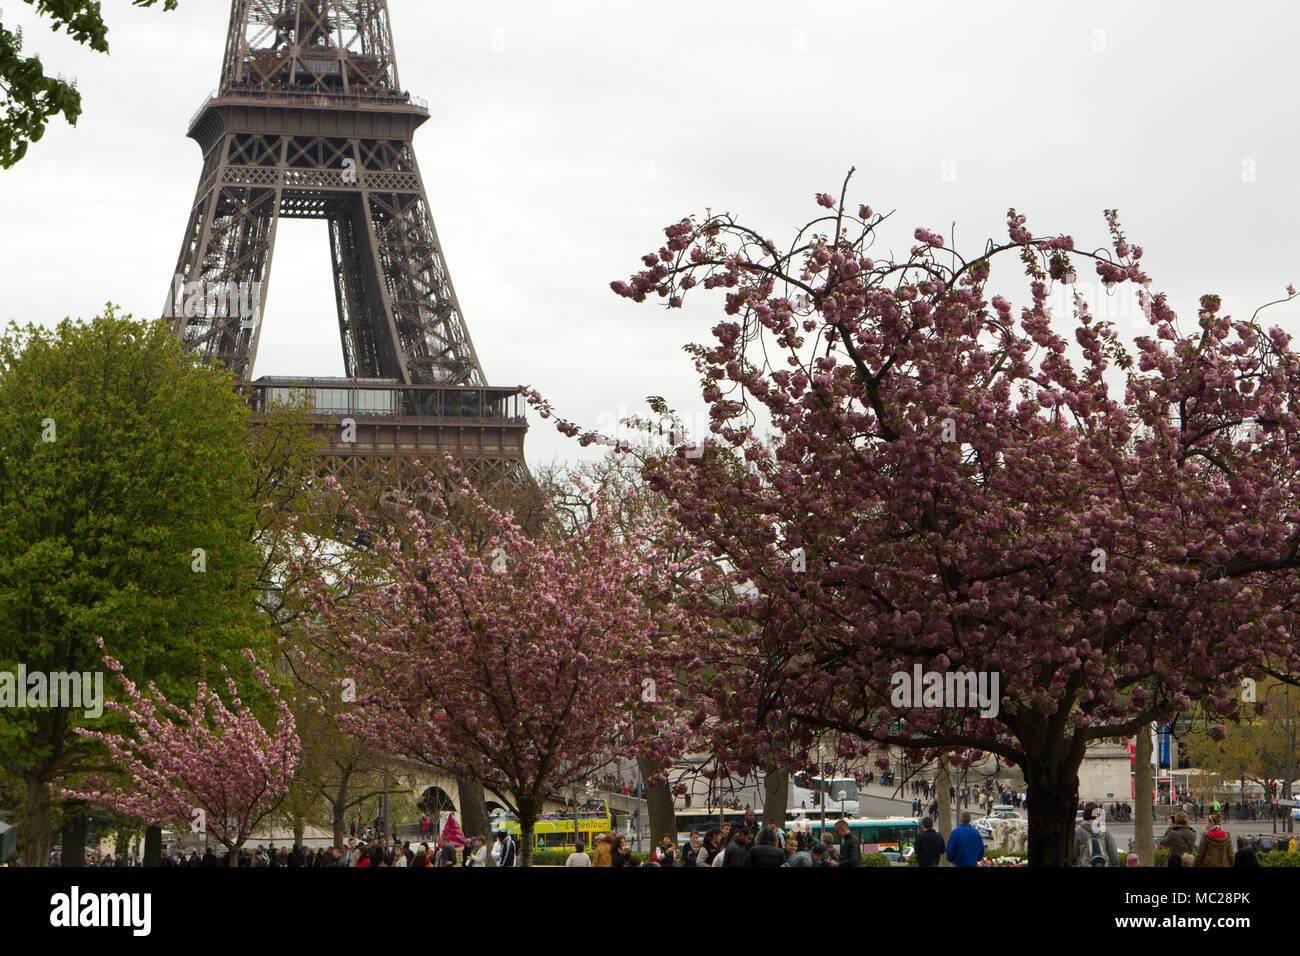 Paris Eiffel tower - Stock Image